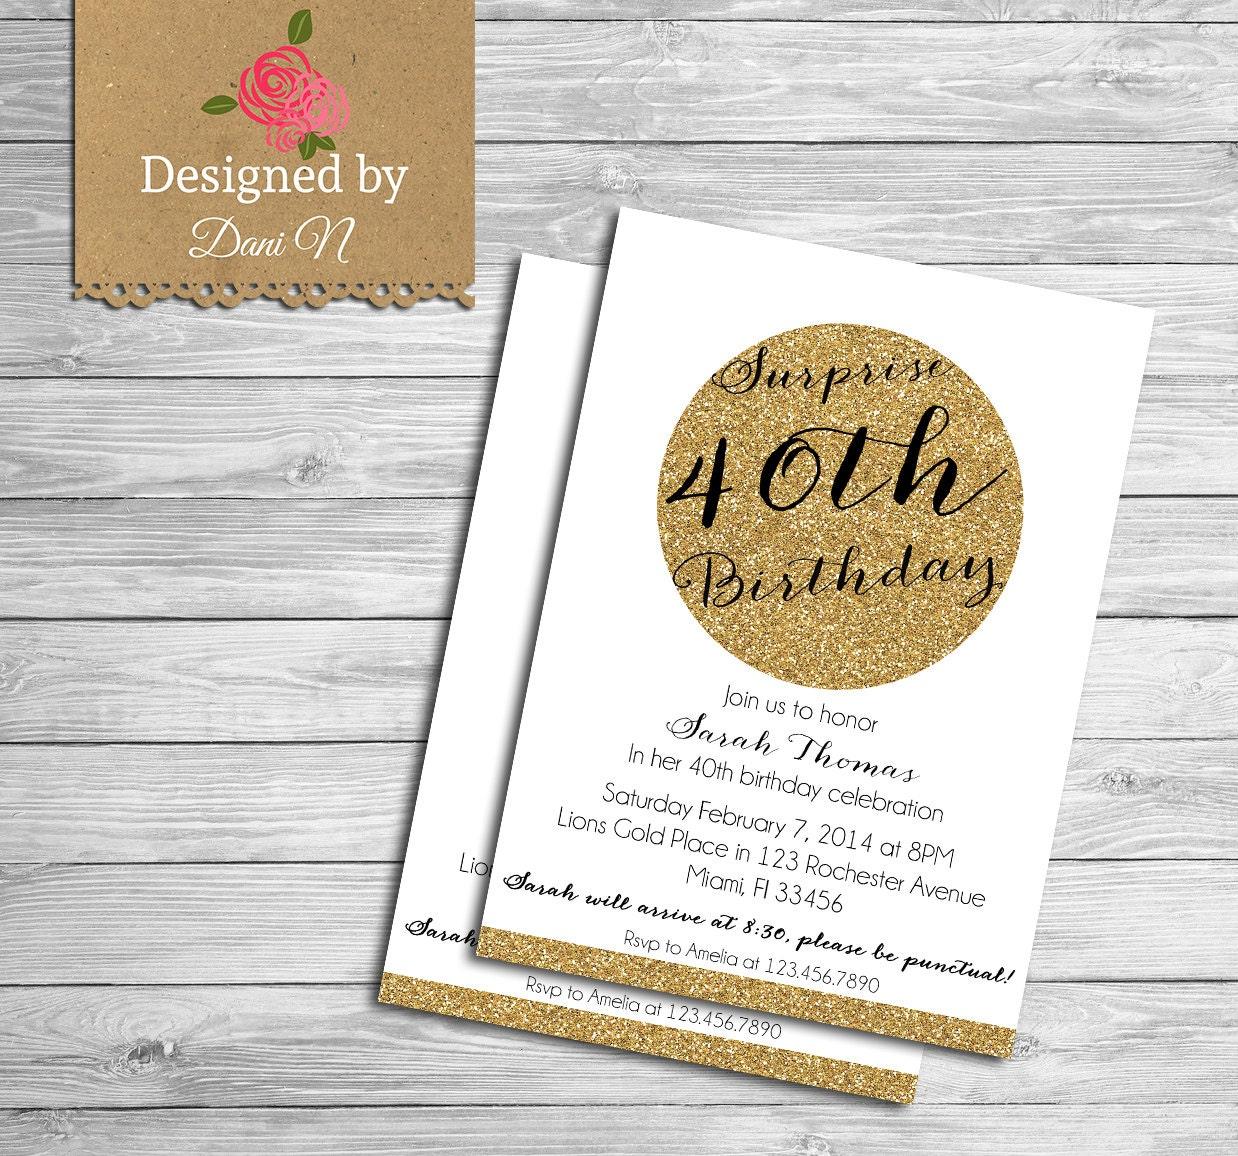 Surprise 40th Birthday Party Invitations | Olivero